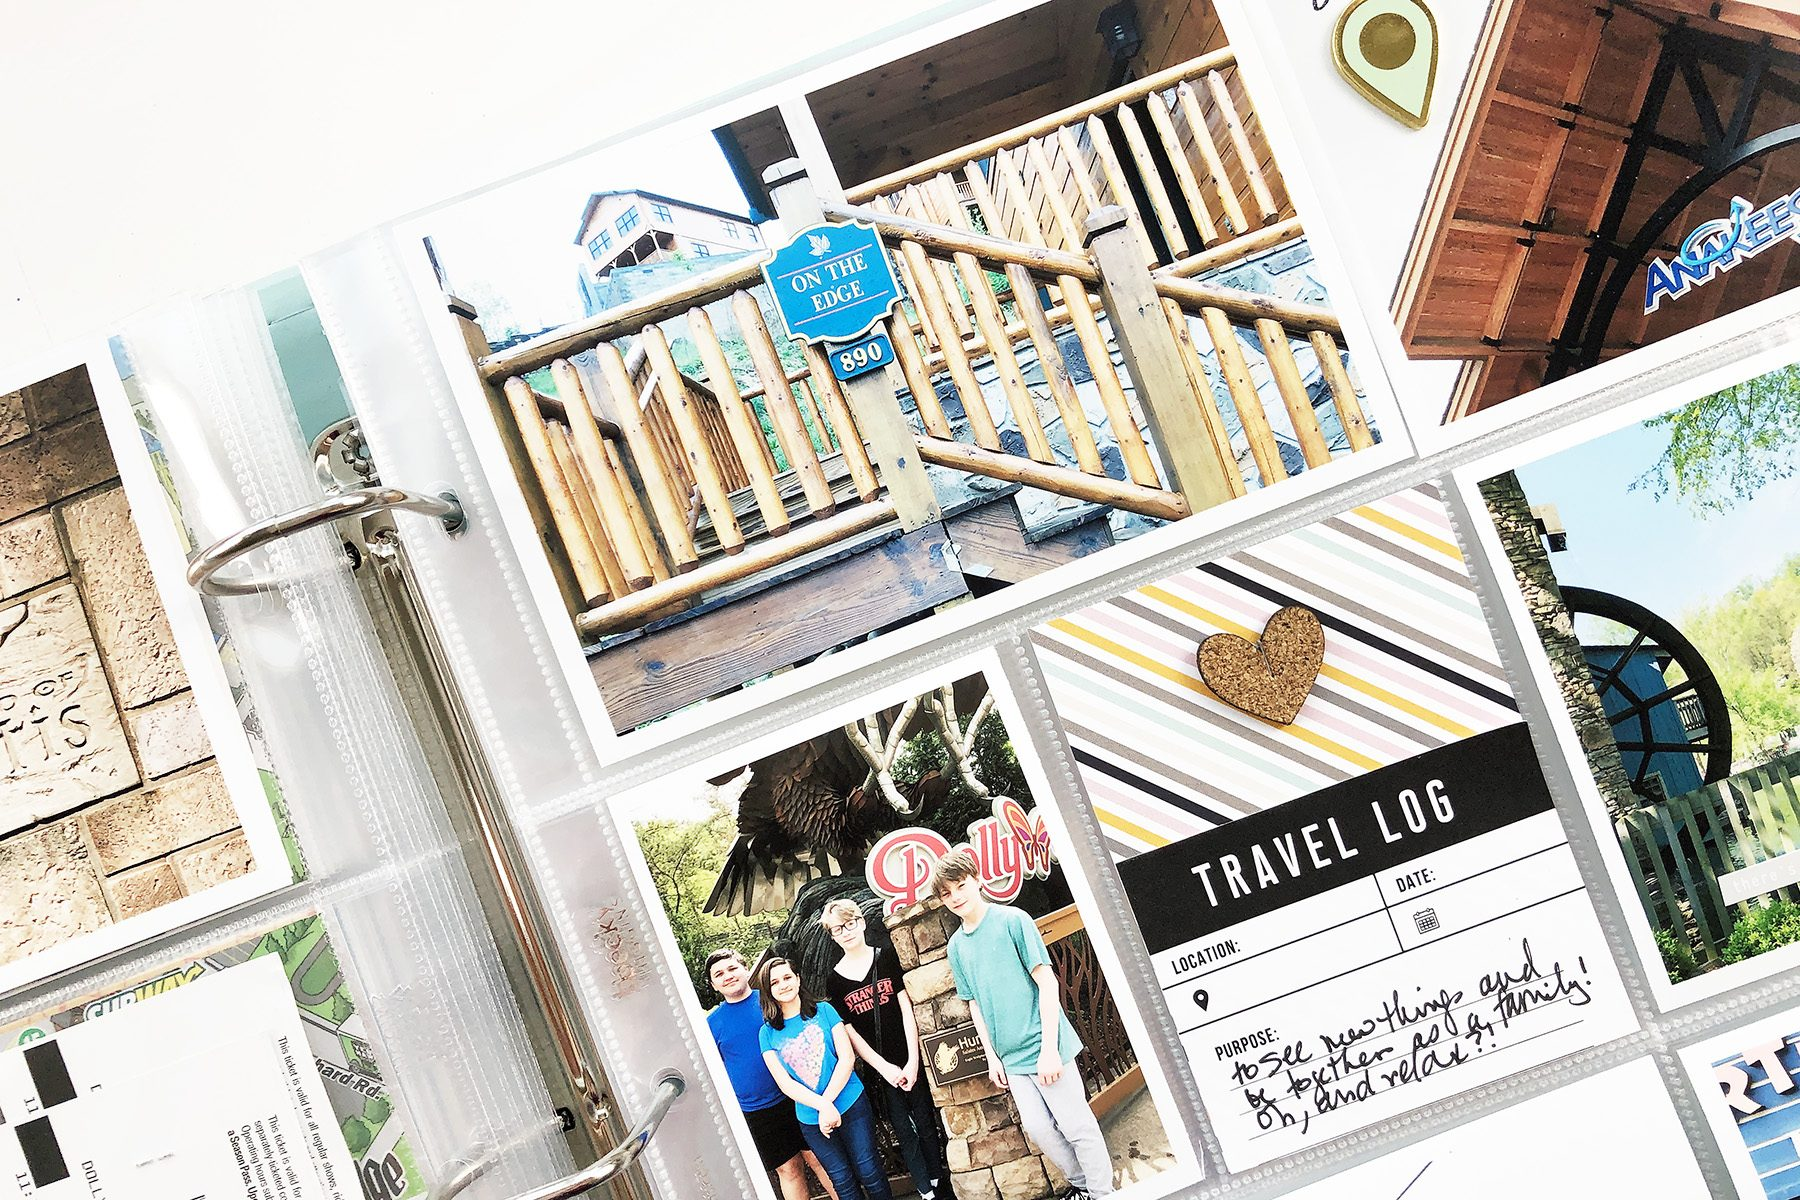 Larkindesign Documenting Travel in Project Life | Part 05 Gatlinburg Final Layout ft. Ali Edwards Travel Kit!!